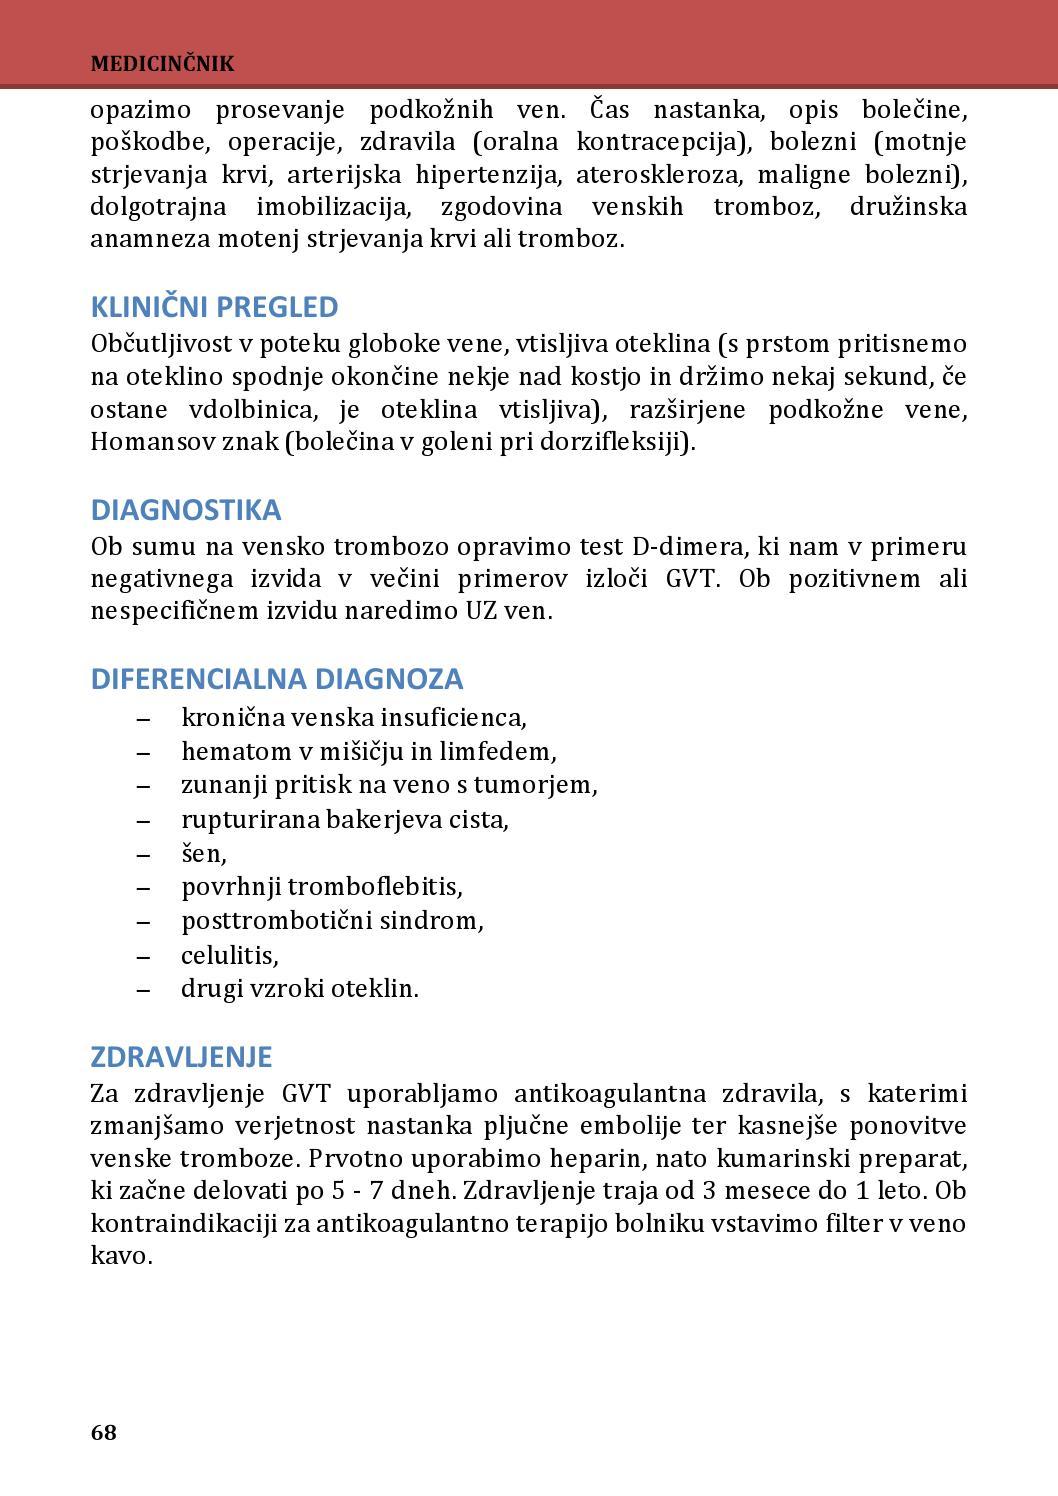 tromboflebitis, hipertenzija